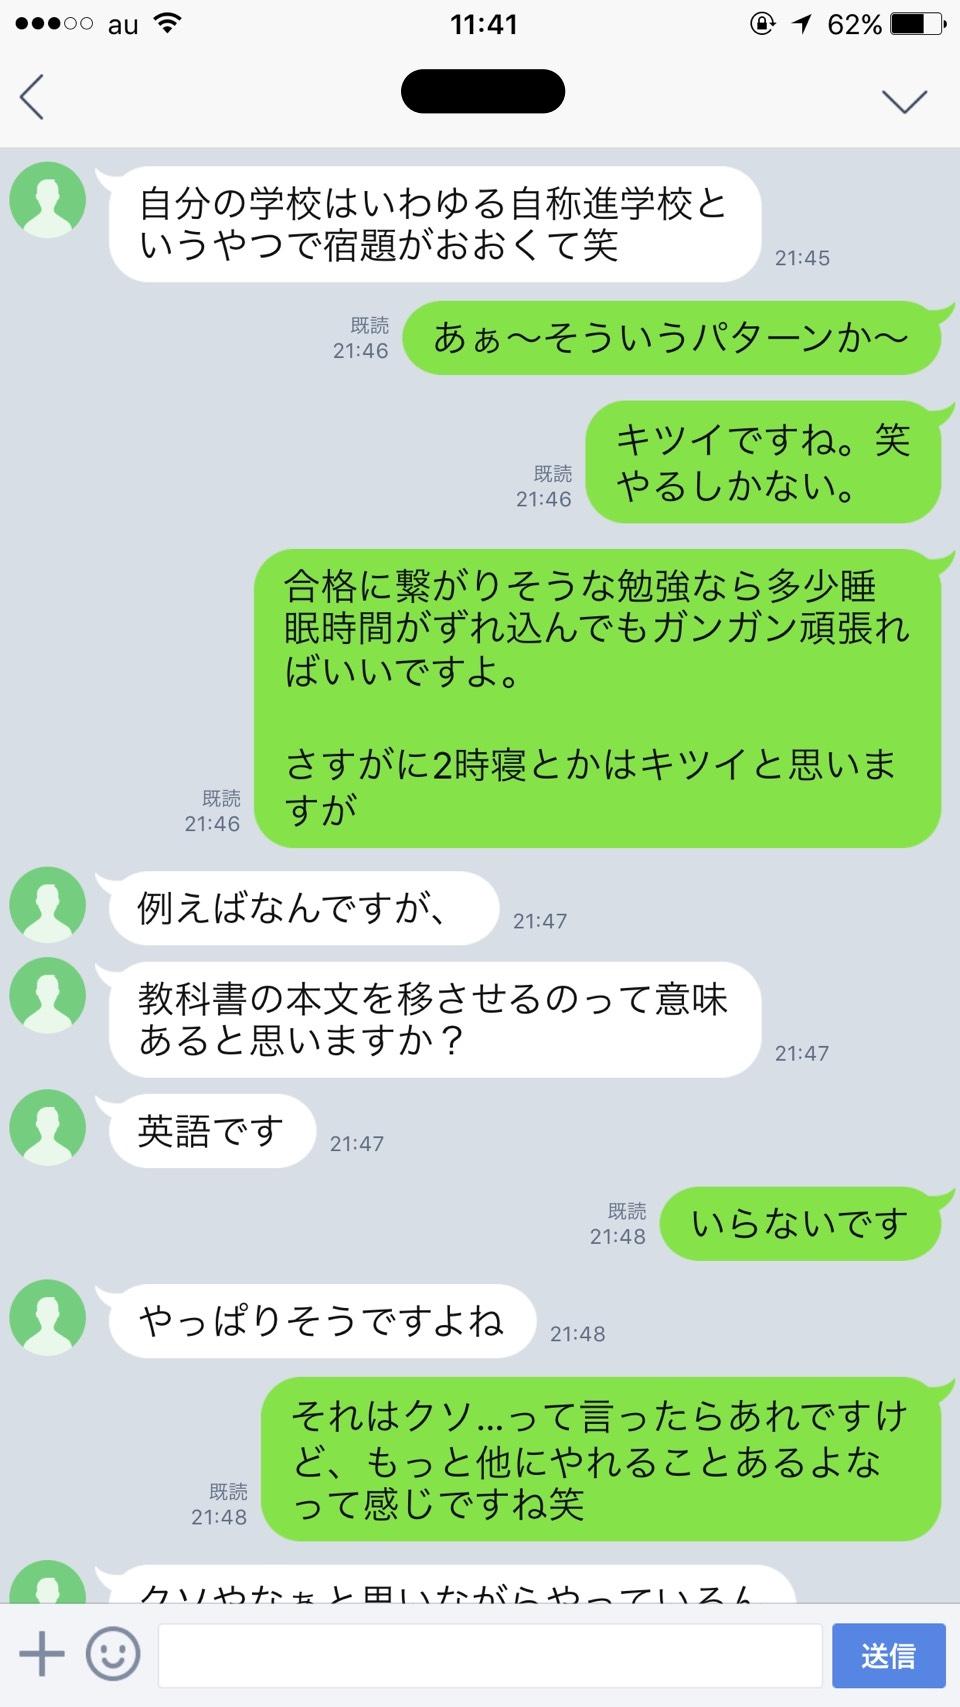 S__12361786